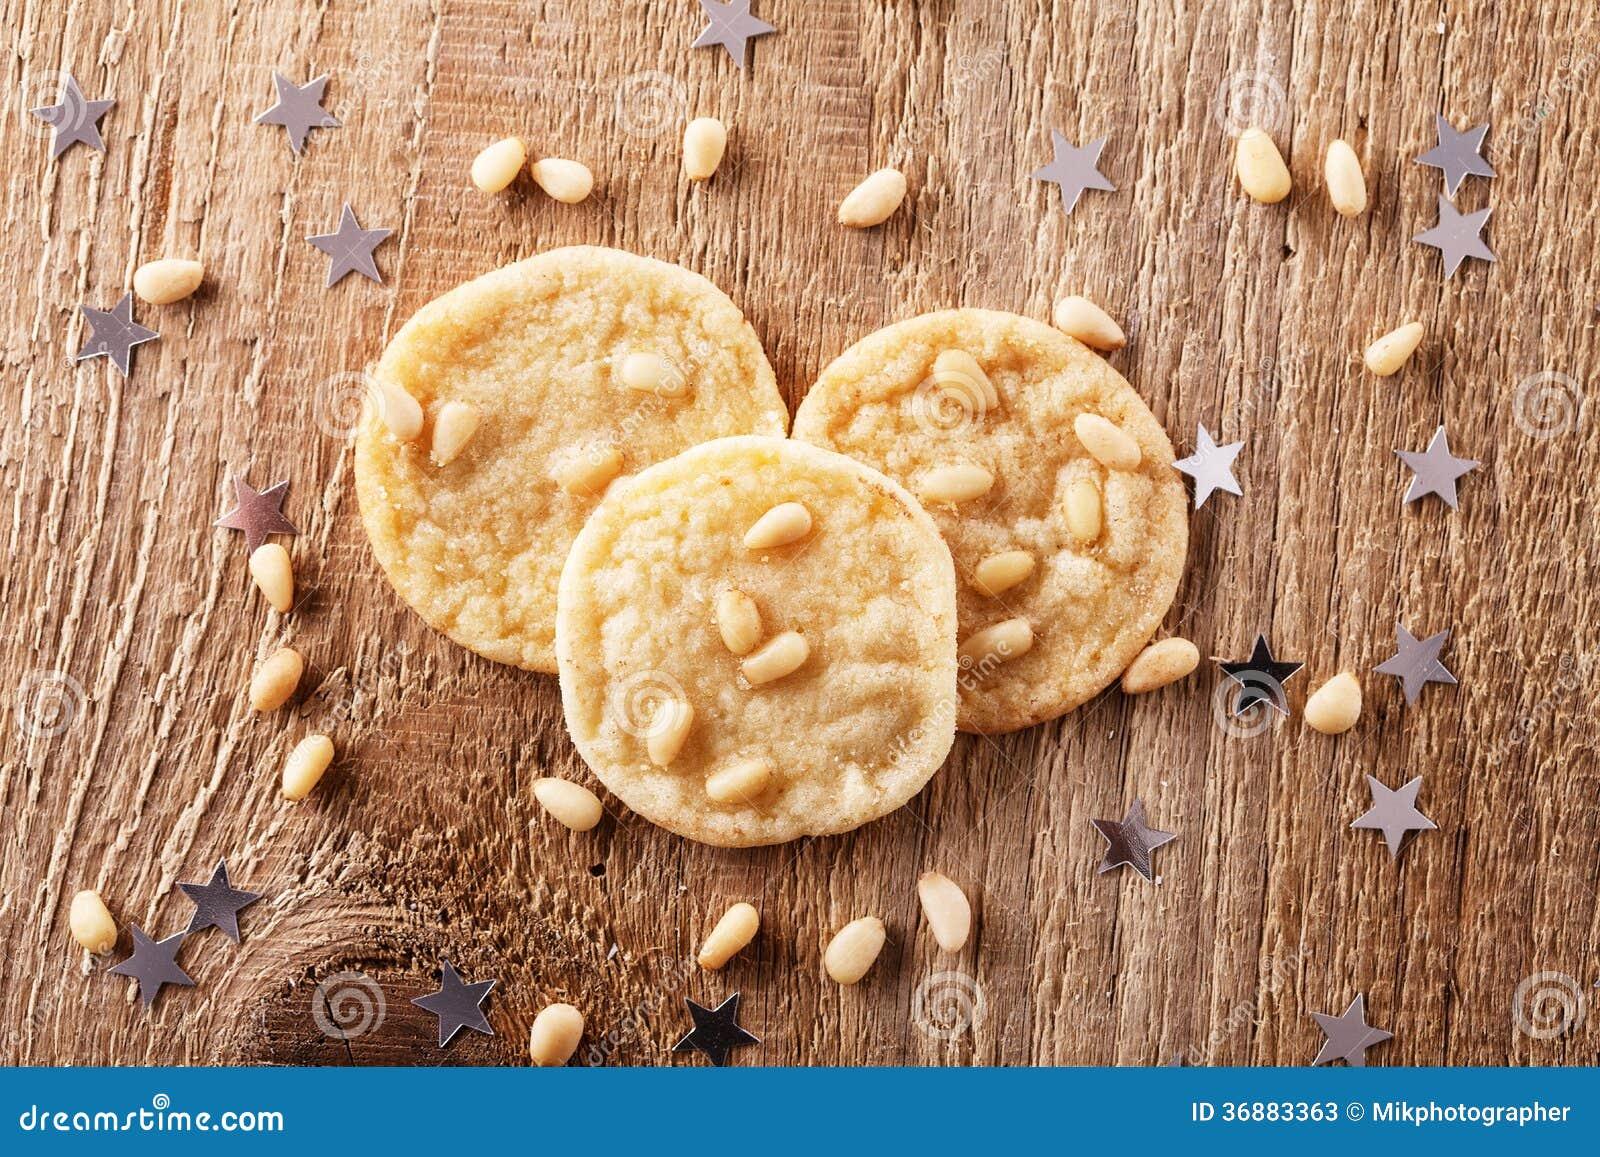 Download Biscotti di Natale immagine stock. Immagine di dieta - 36883363